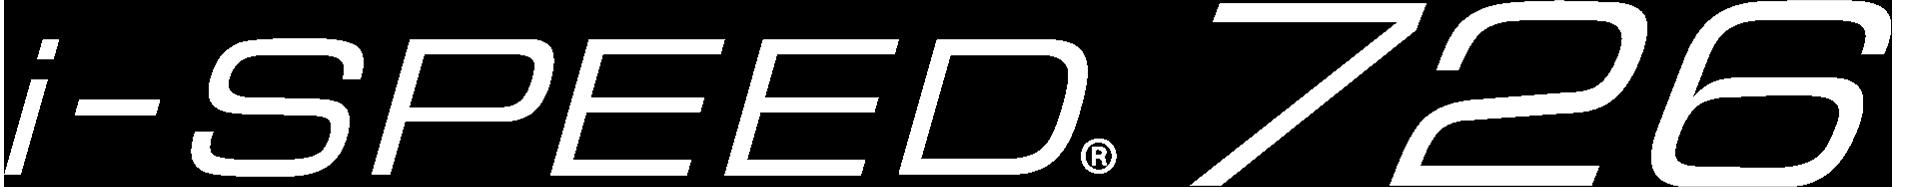 i-SPEED 726 logo.